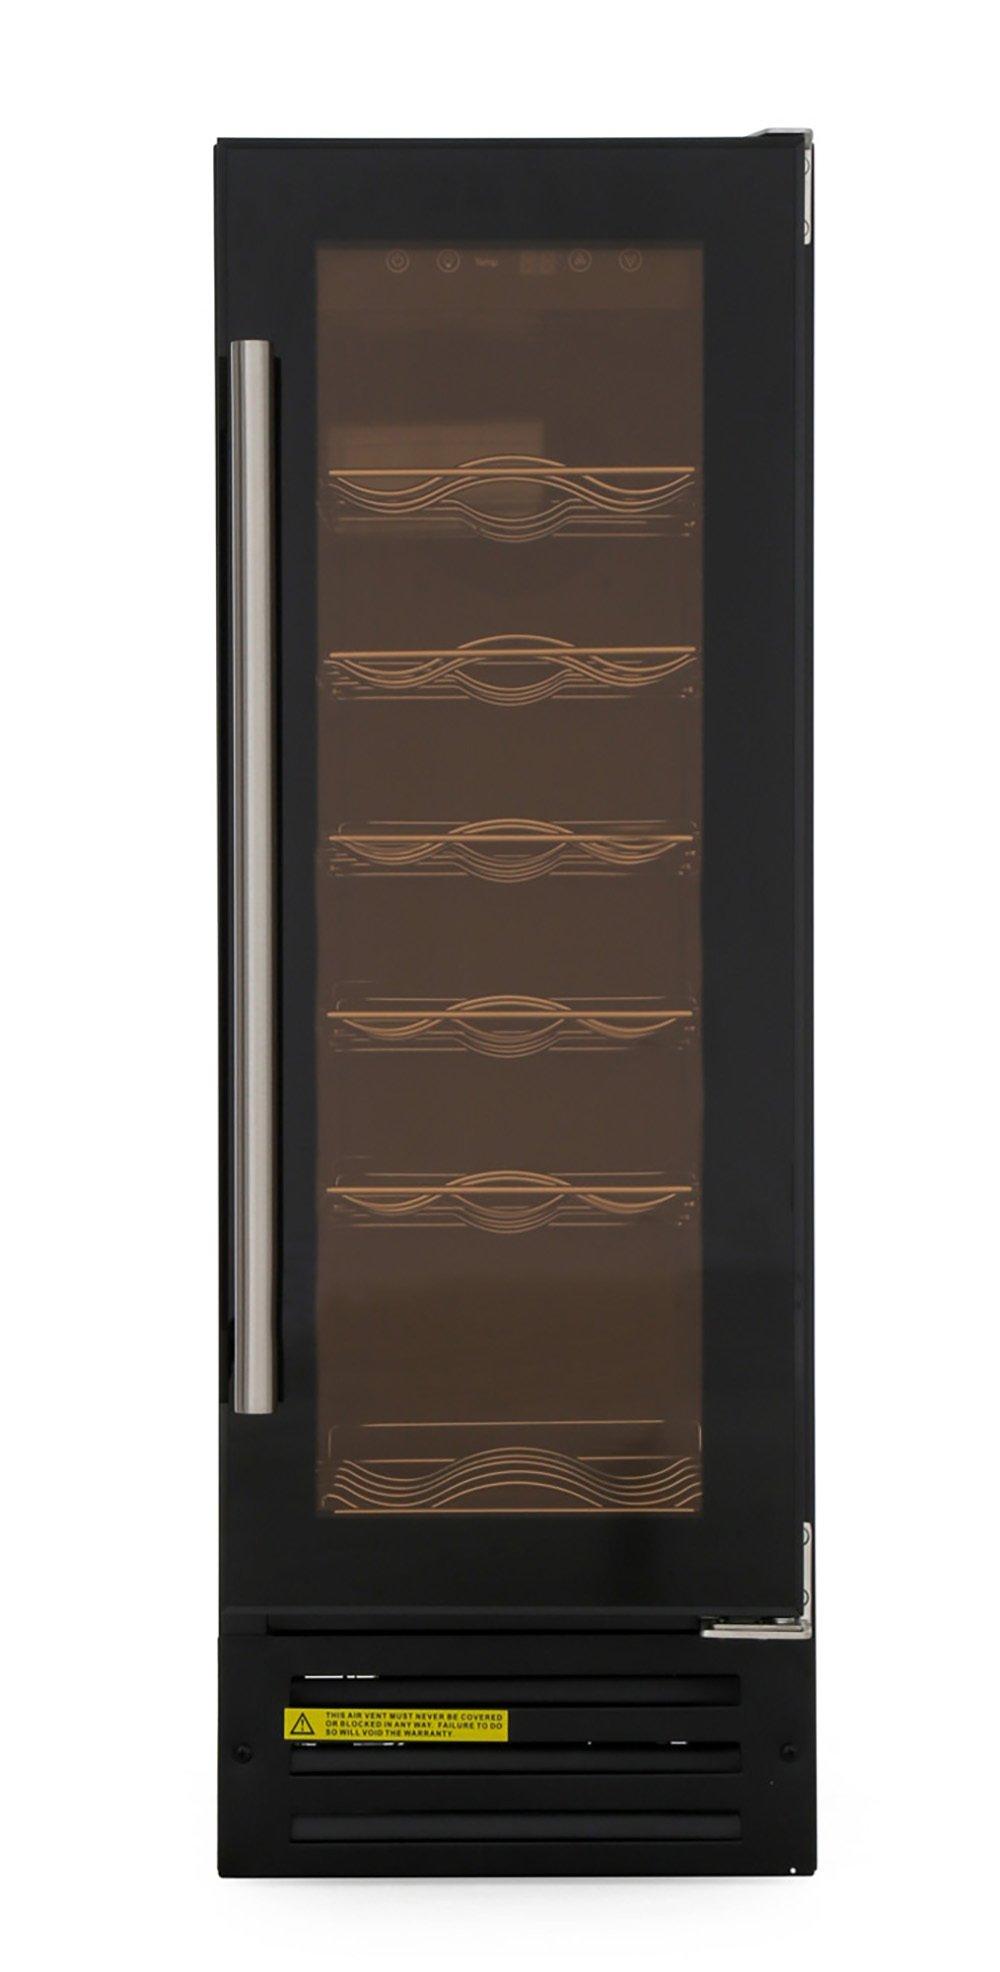 Culina UBWC300B.1 Wine Cooler